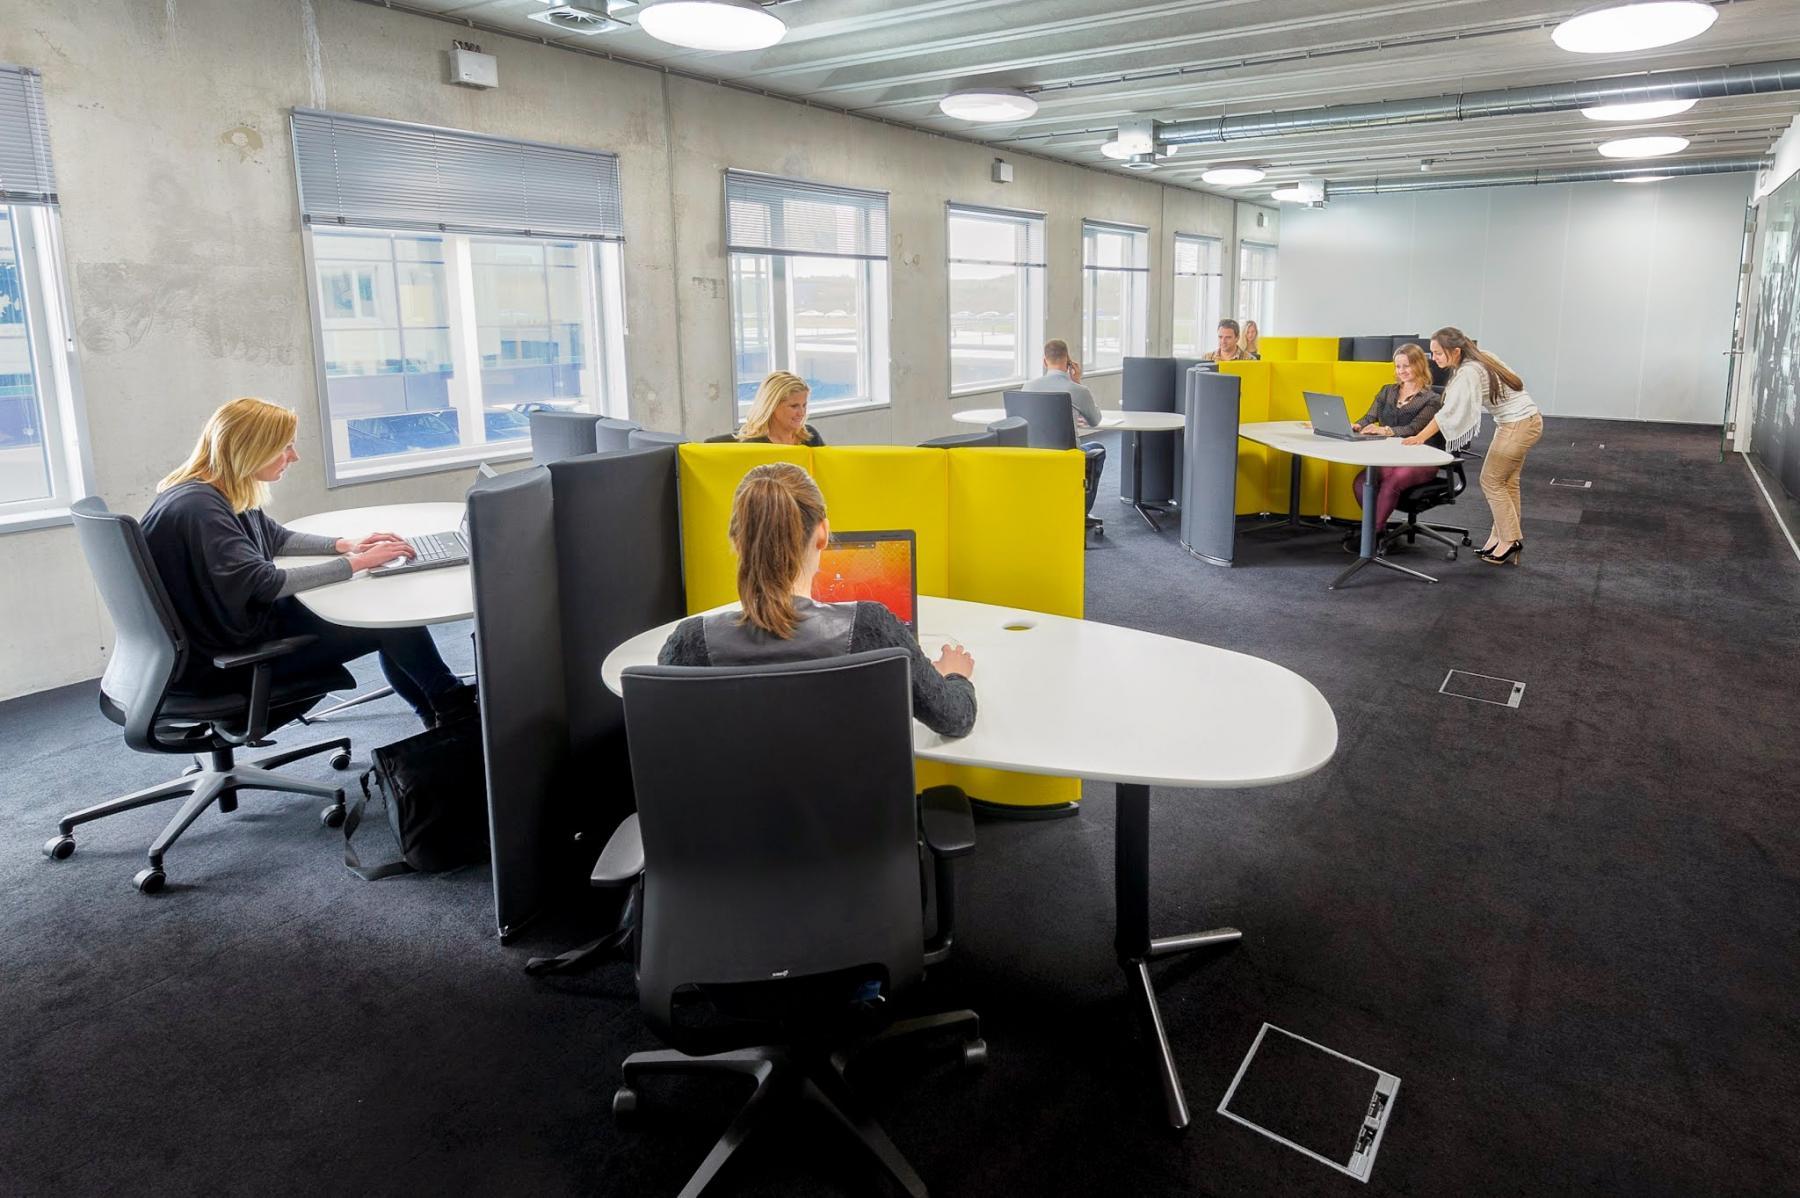 flexwerkplekken om te flexwerken in rotterdam brainpark huren